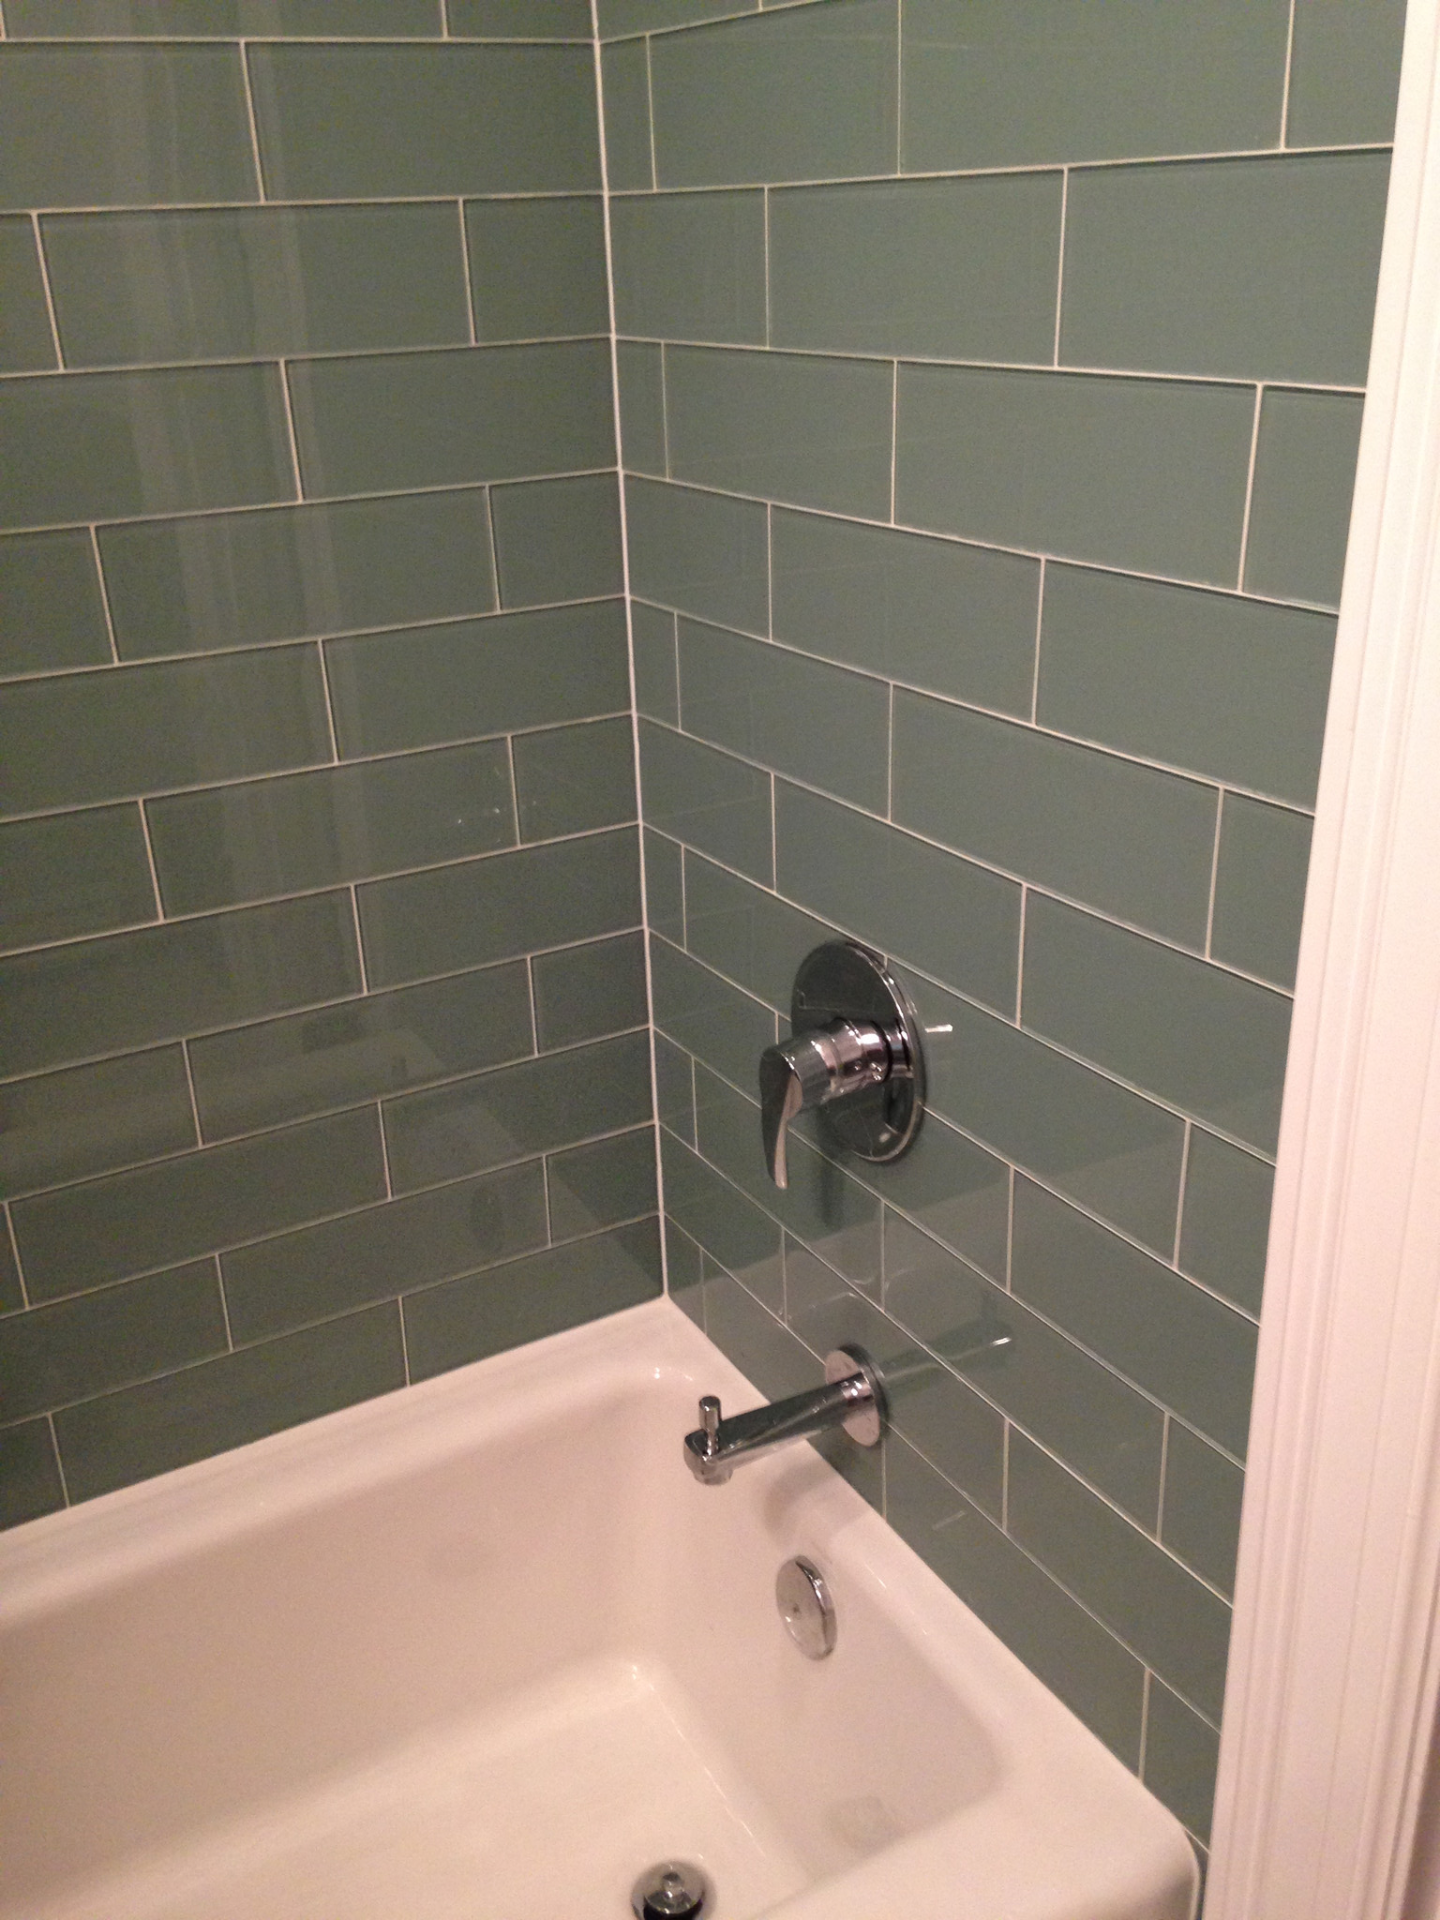 Seaside Blue 4x12 Glass Subway Tiles Home Tiles Bathroom Glass